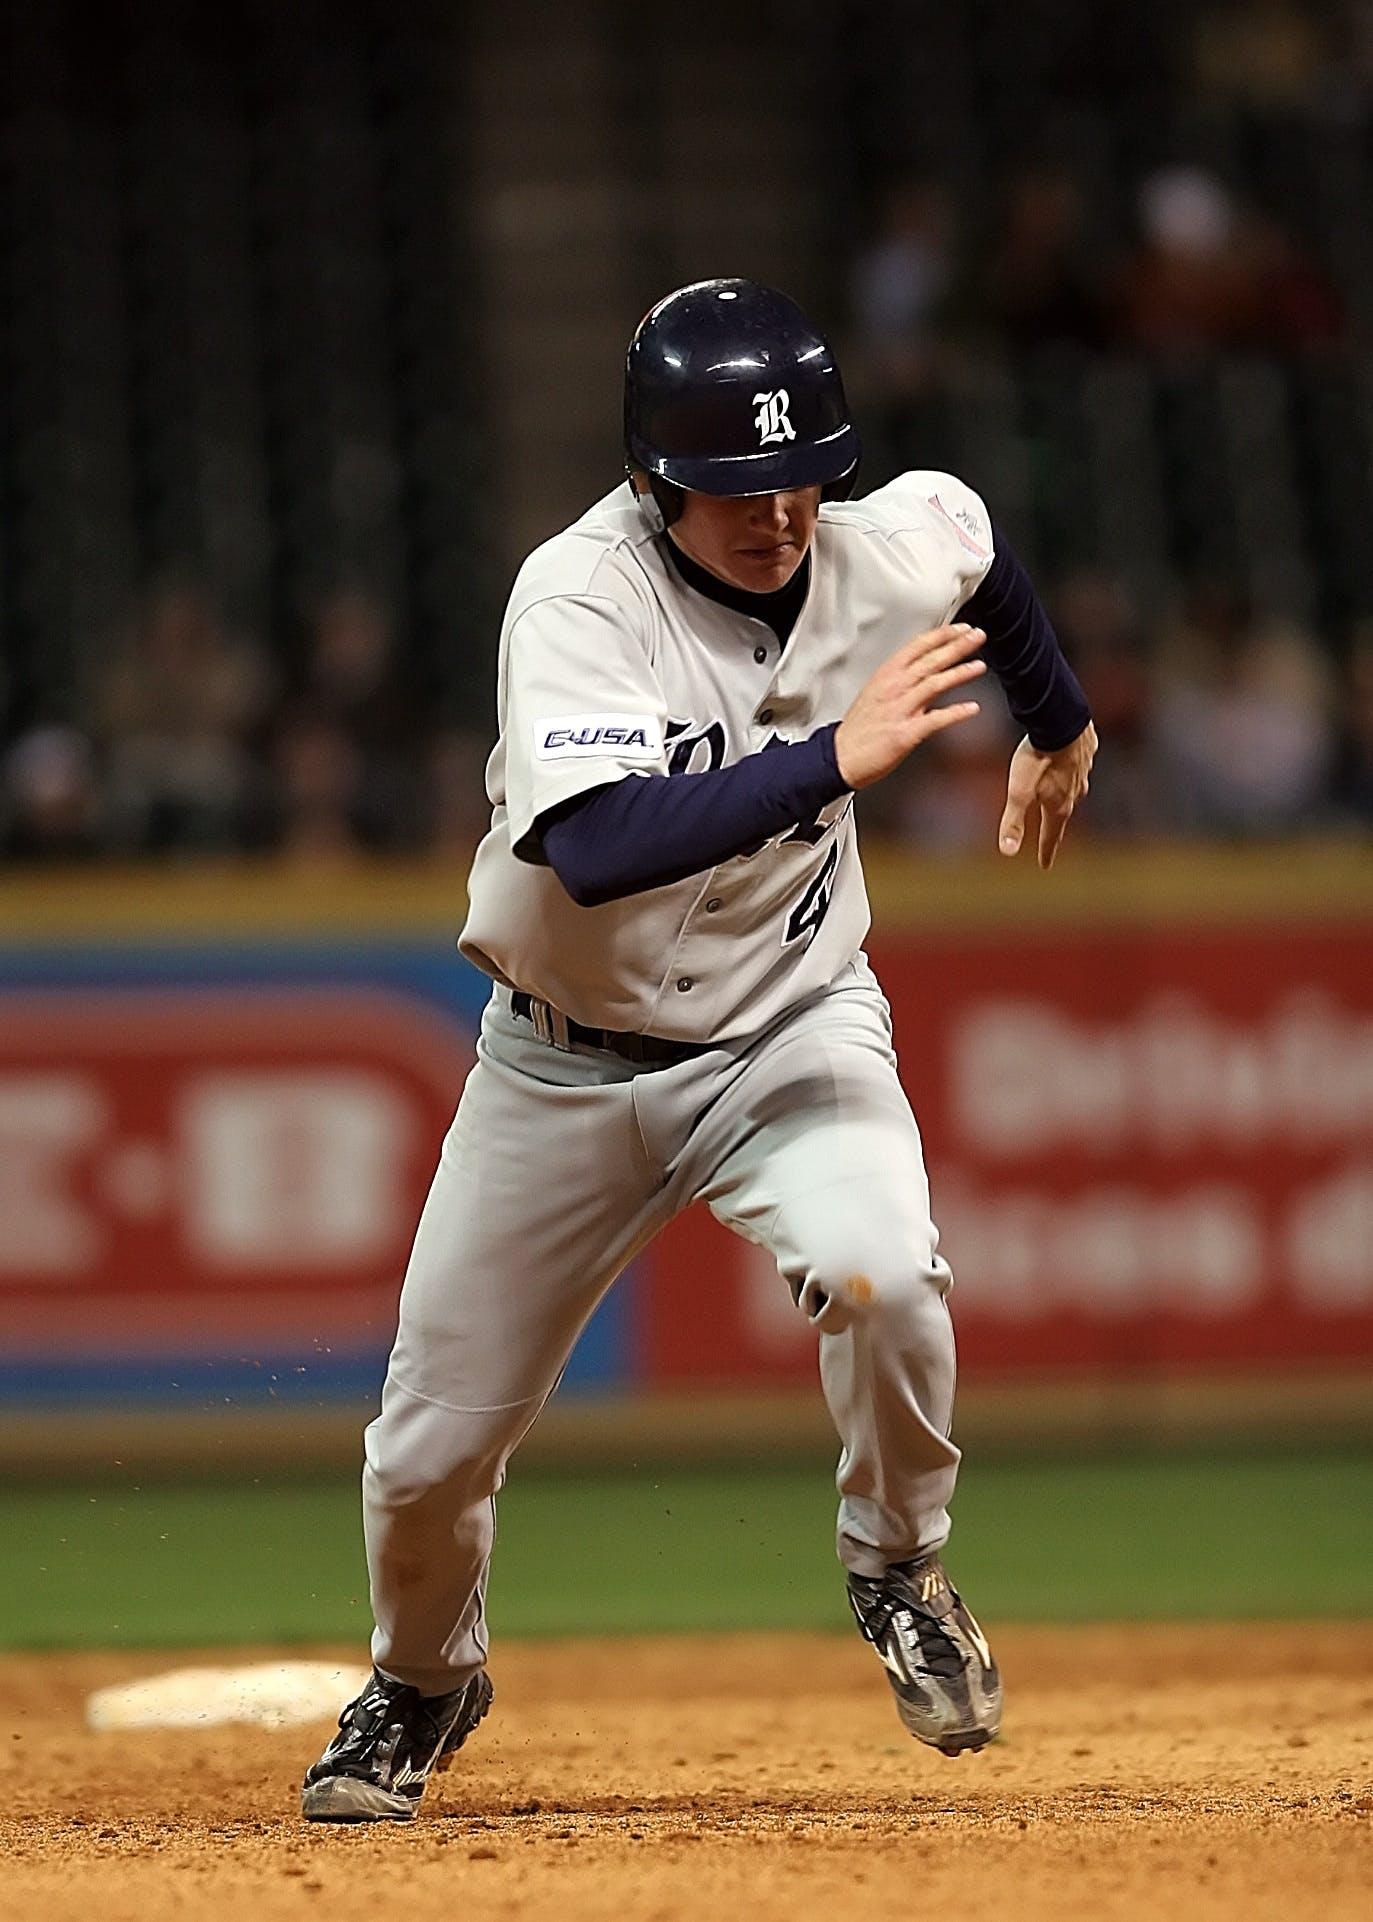 Man Playing Baseball Photo